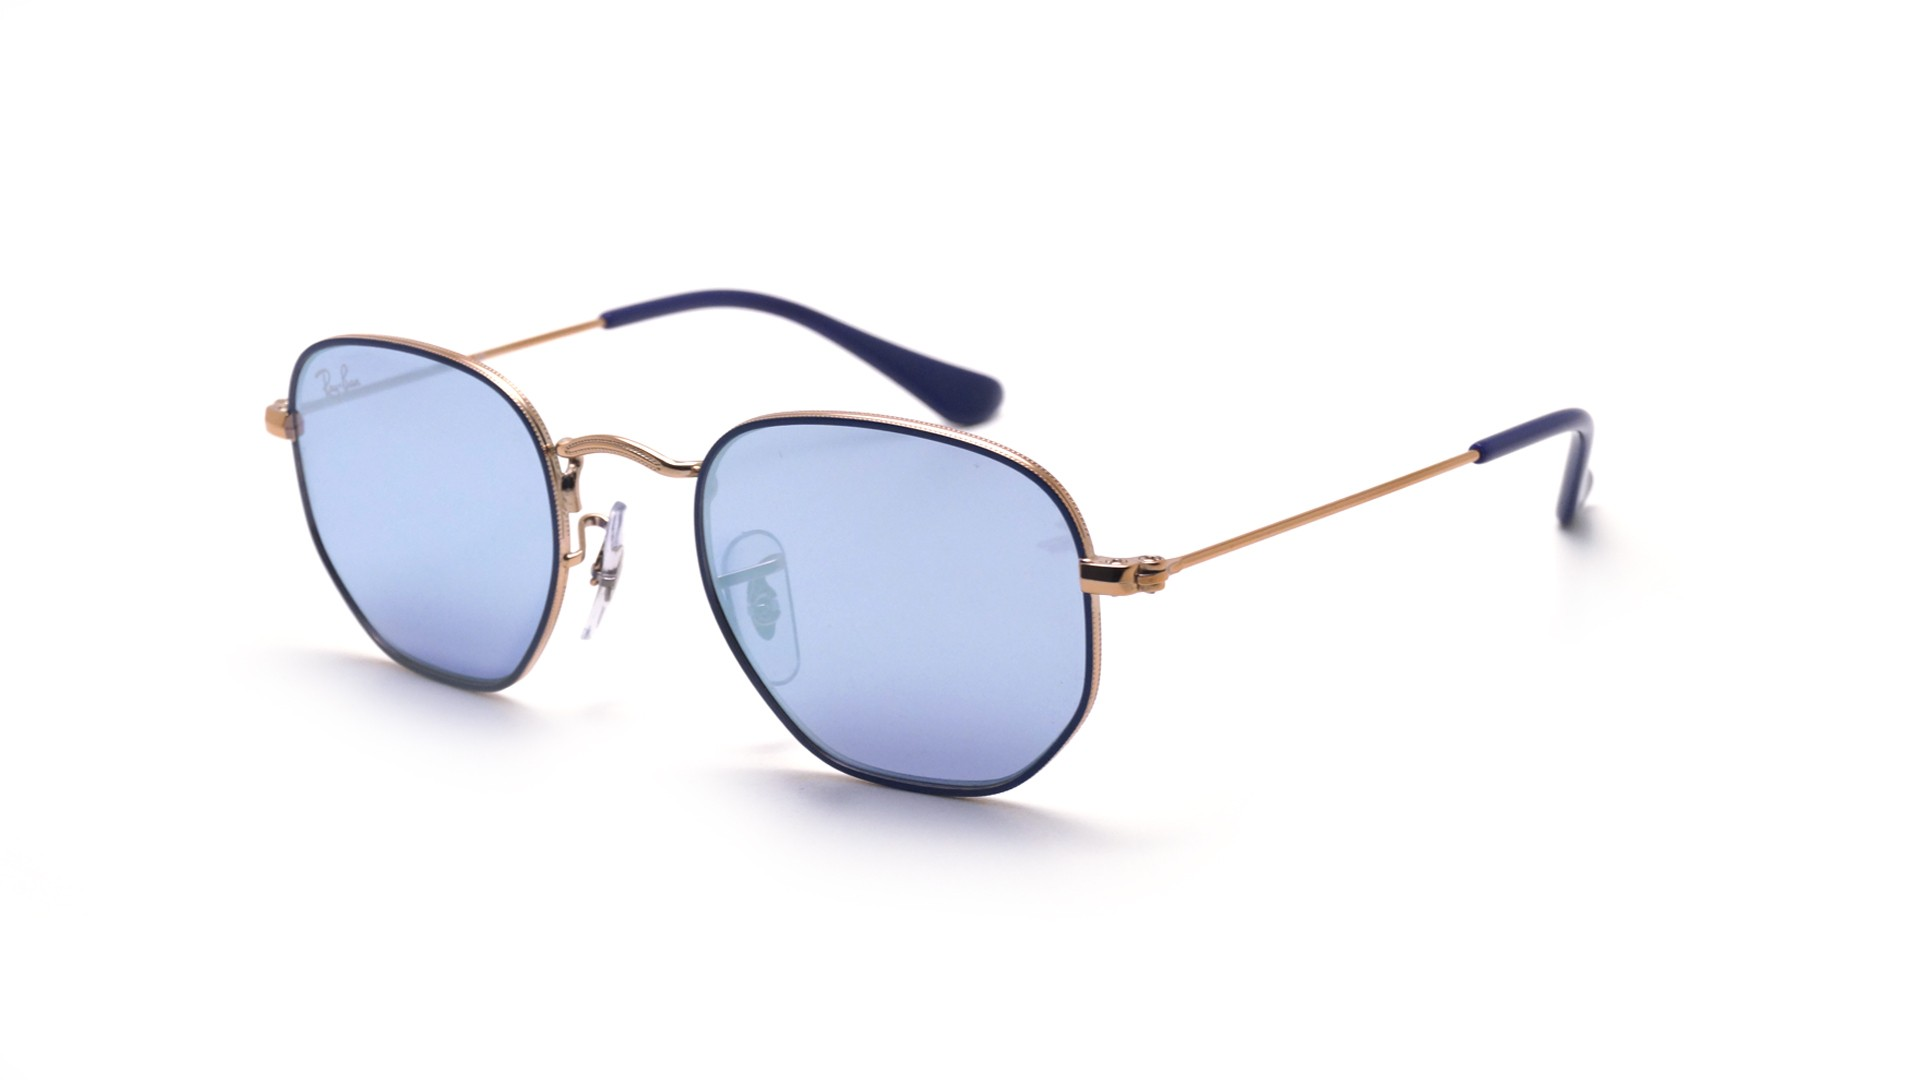 00f25e5befda3 Sunglasses Ray-Ban Hexagonal Flat Lenses Blue RJ9541SN 264 1U 44-19 Junior  Mirror